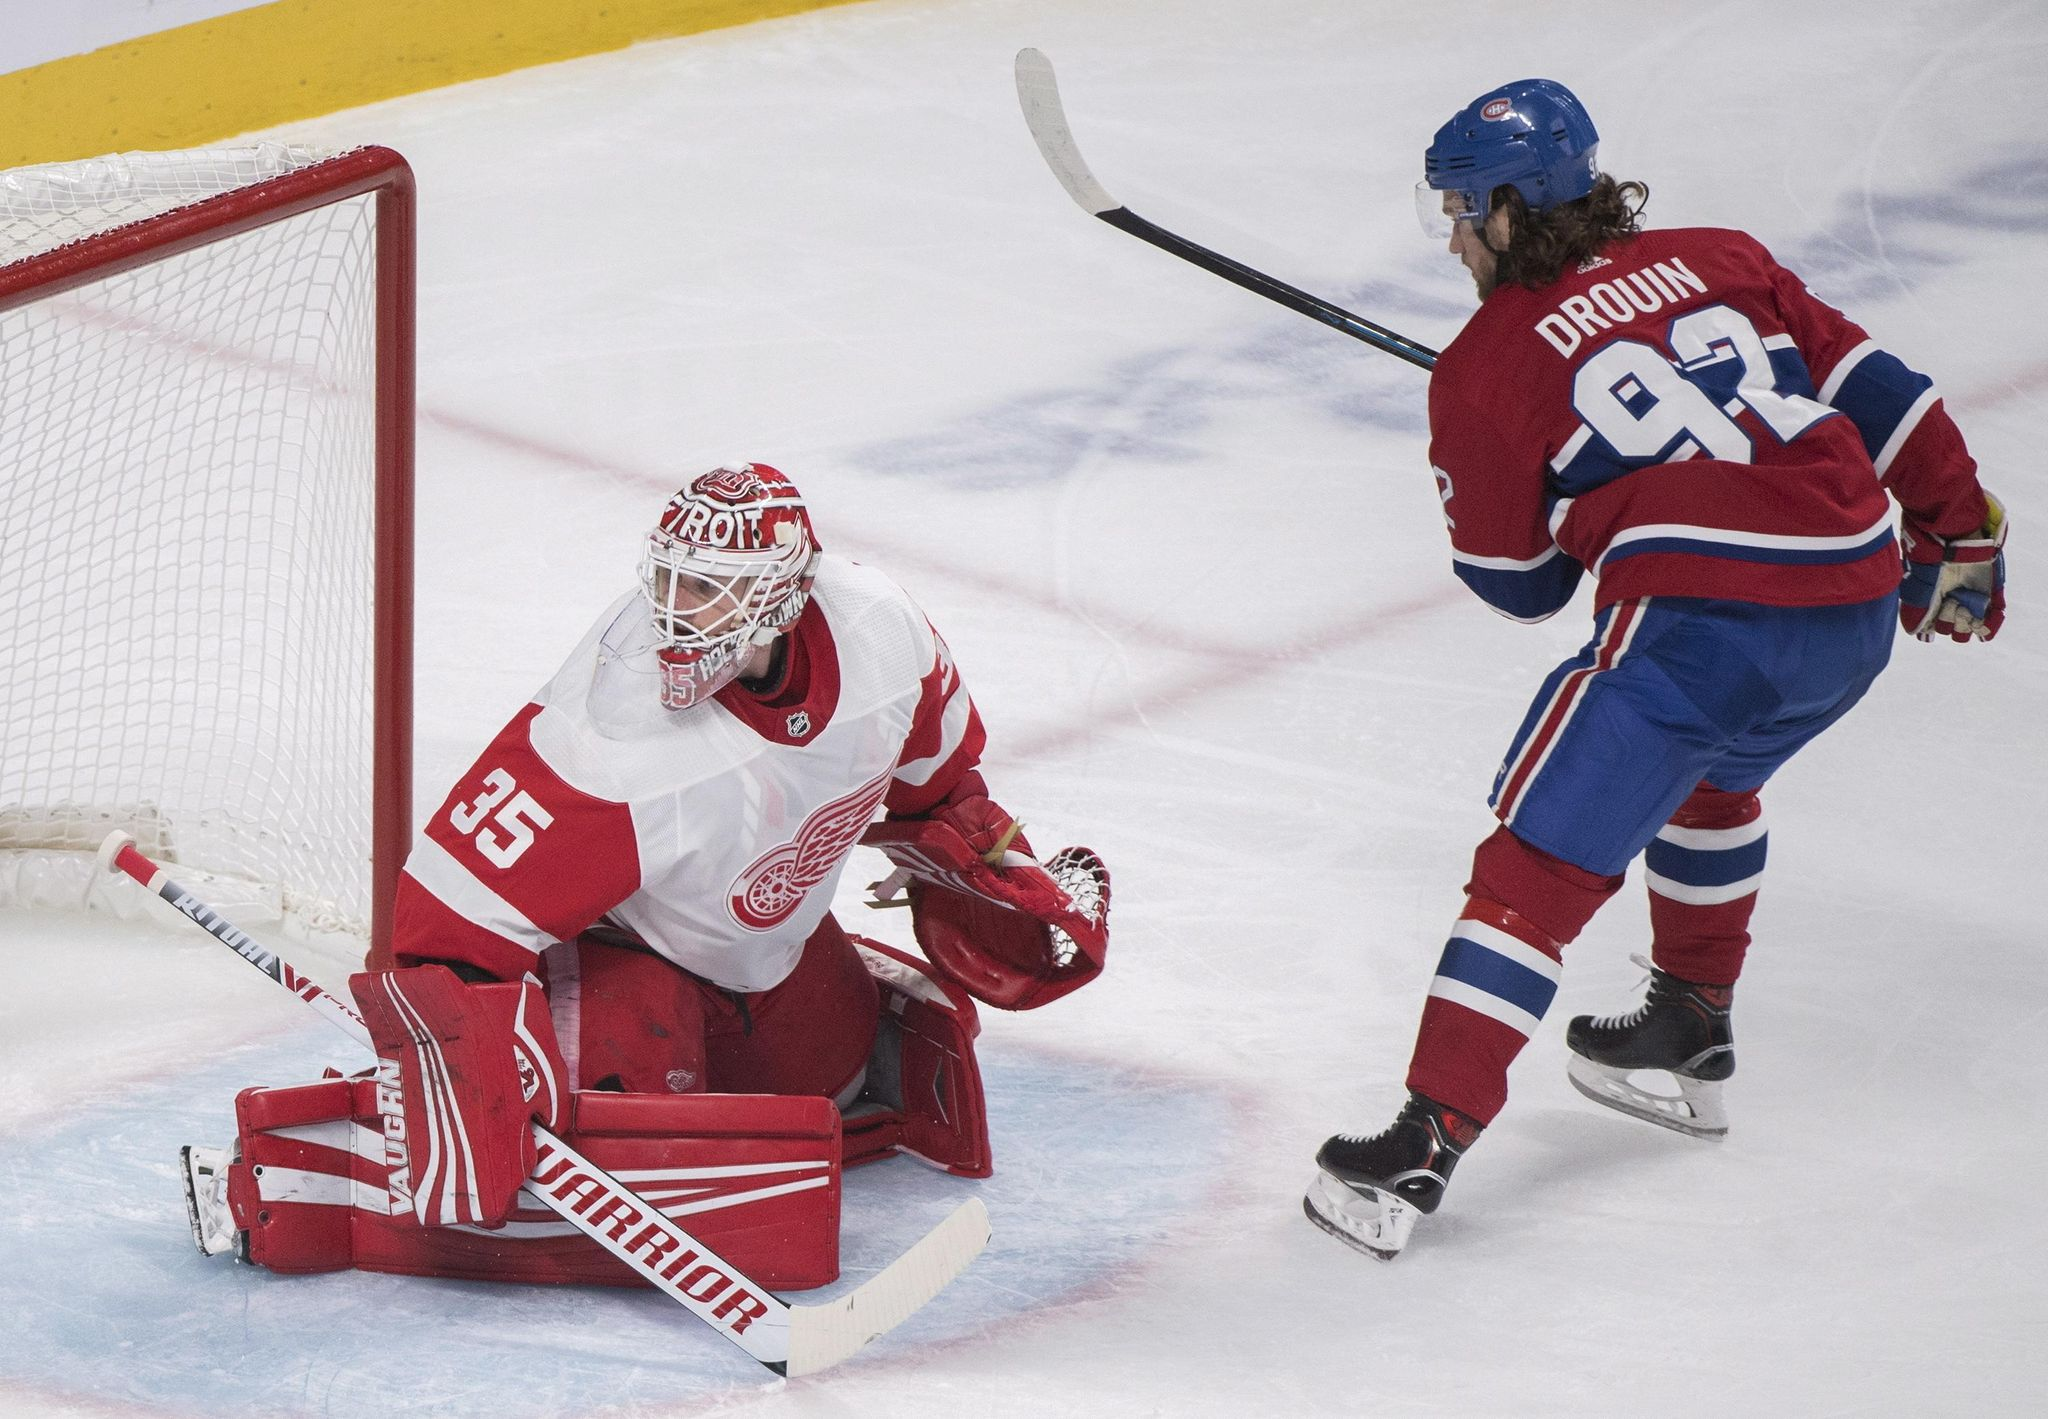 Red_wings_canadiens_hockey_39329_s2048x1419